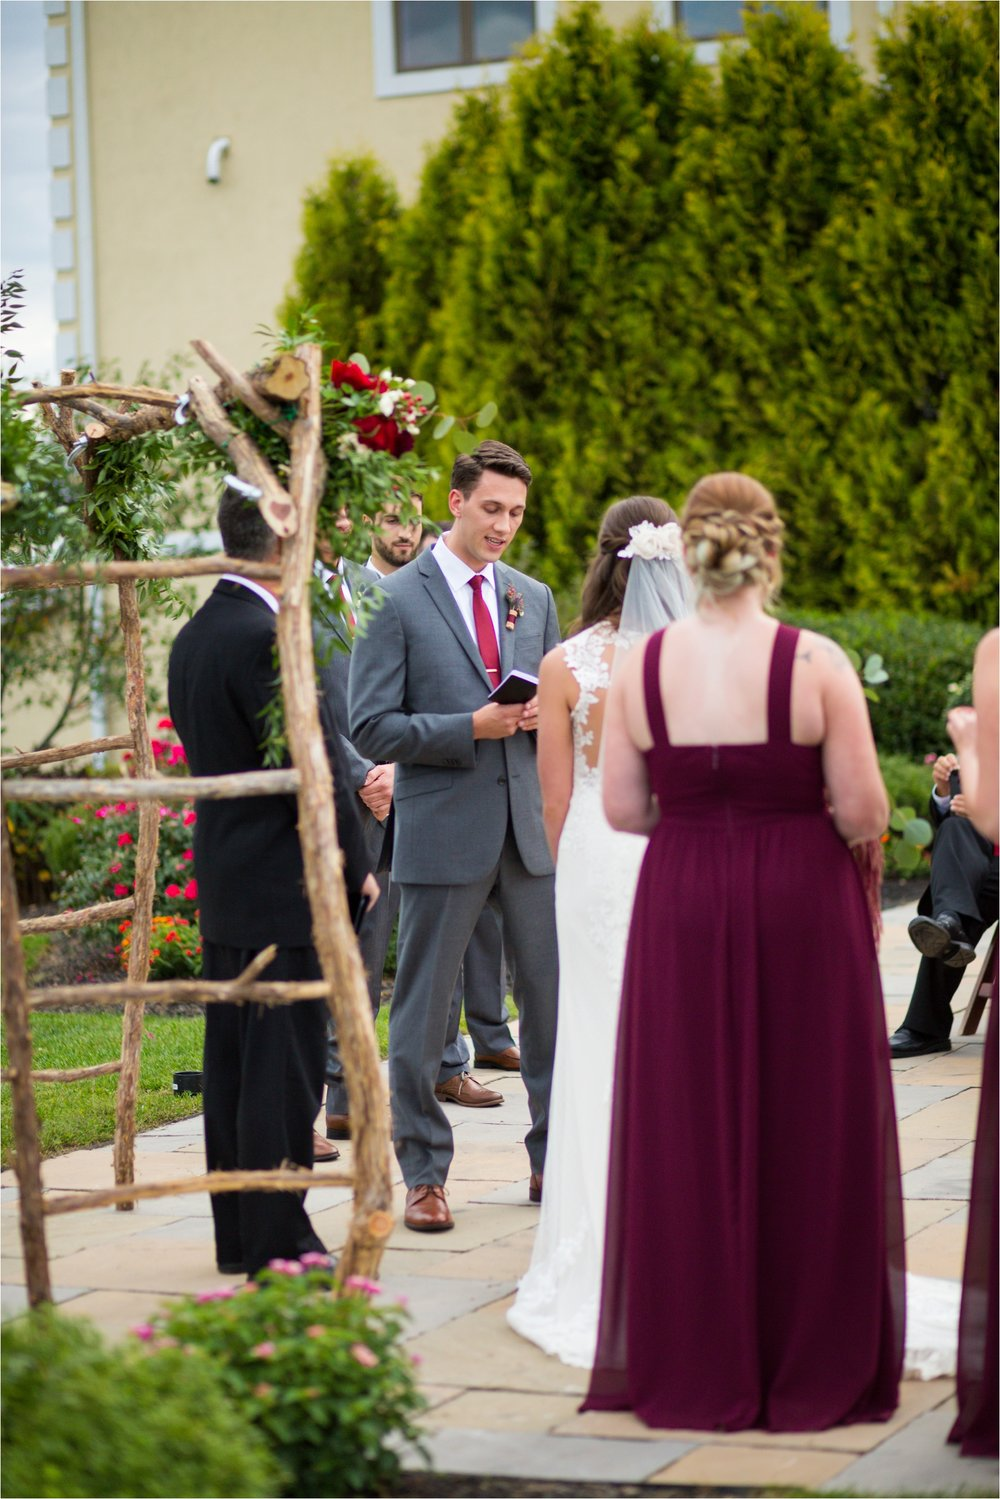 Feather-and-Oak-Photography-Cross-Keys-Vineyard-Wedding-0888.jpg